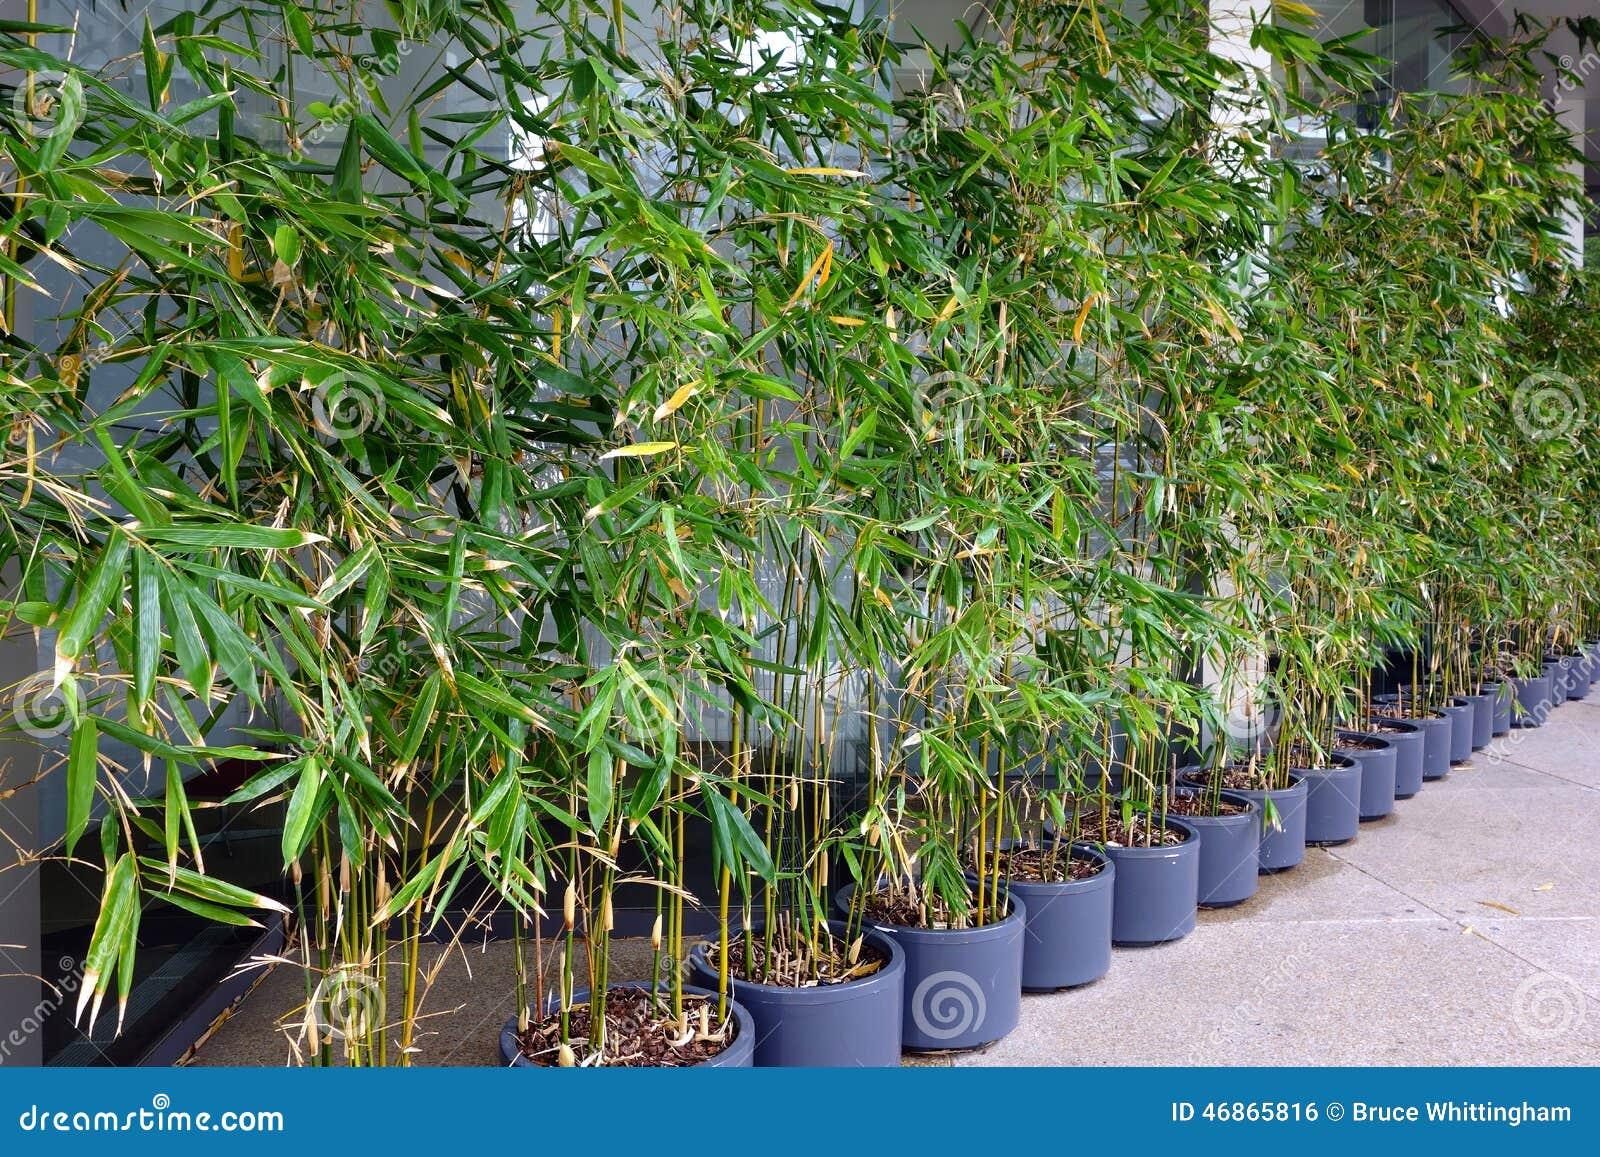 Vendita piante bambu piante di bamb in vasi fotografia for Vendita bambu